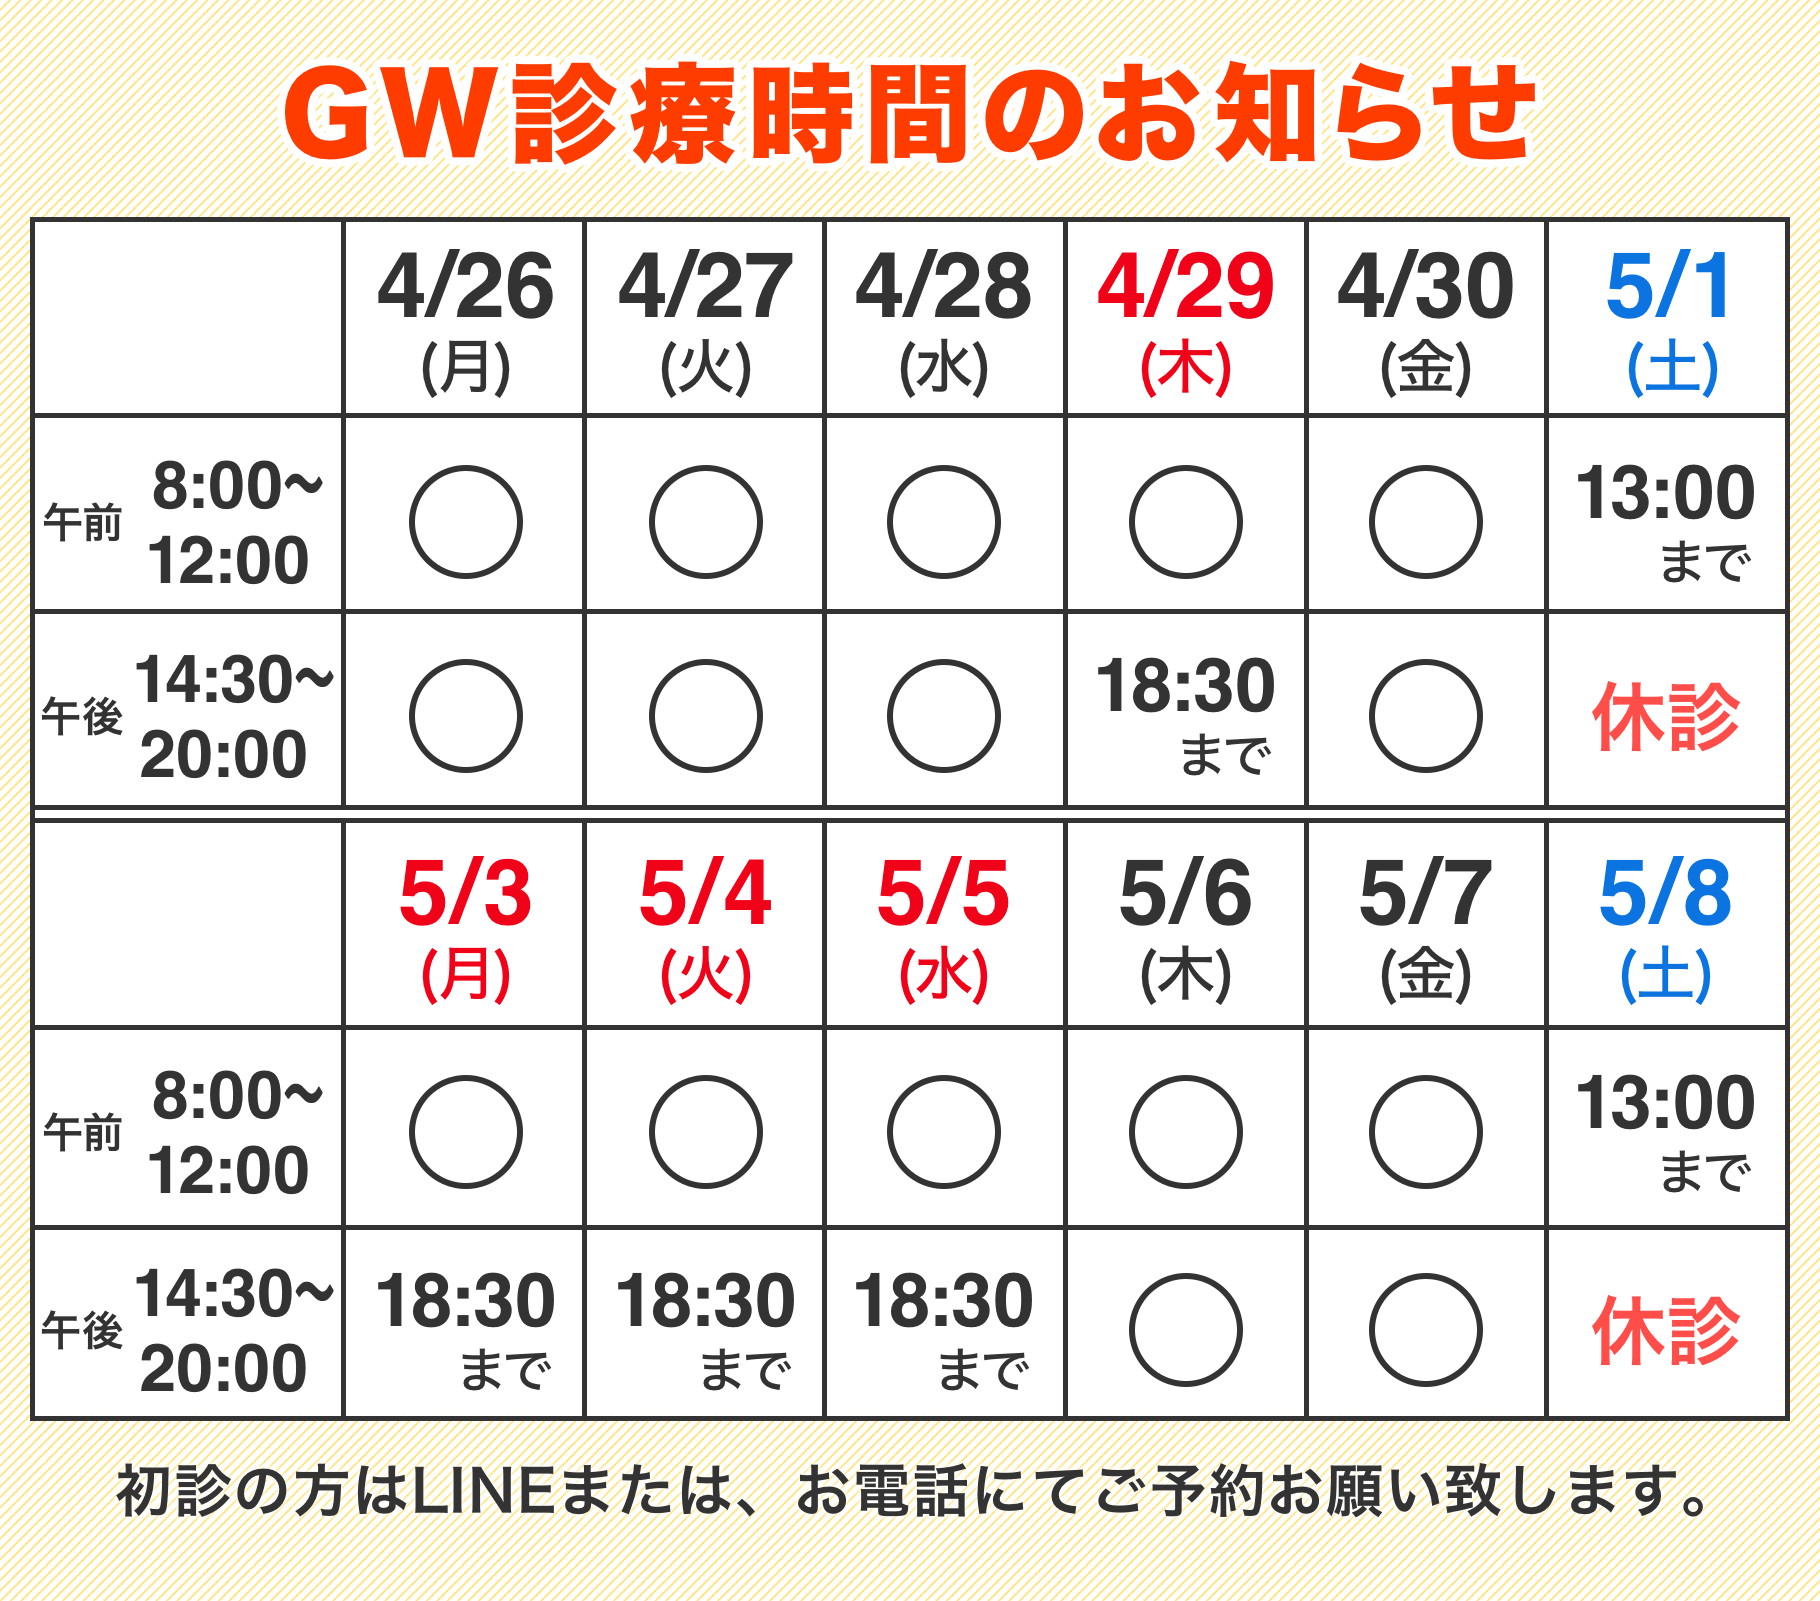 GWの診療時間ご案内